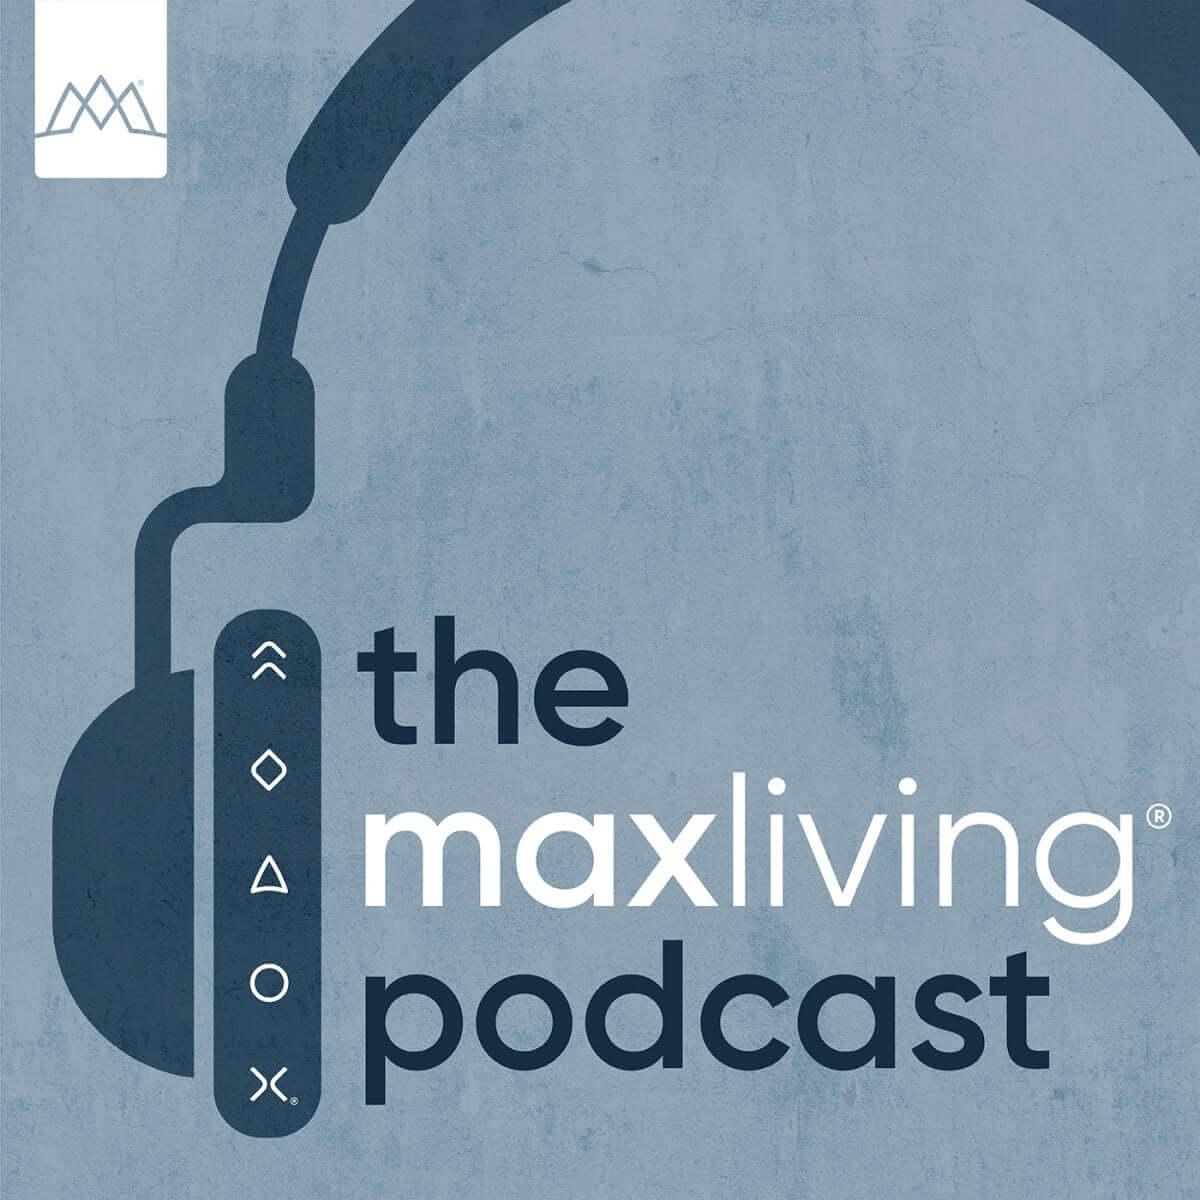 The MaxLiving Podcast Album Artwork